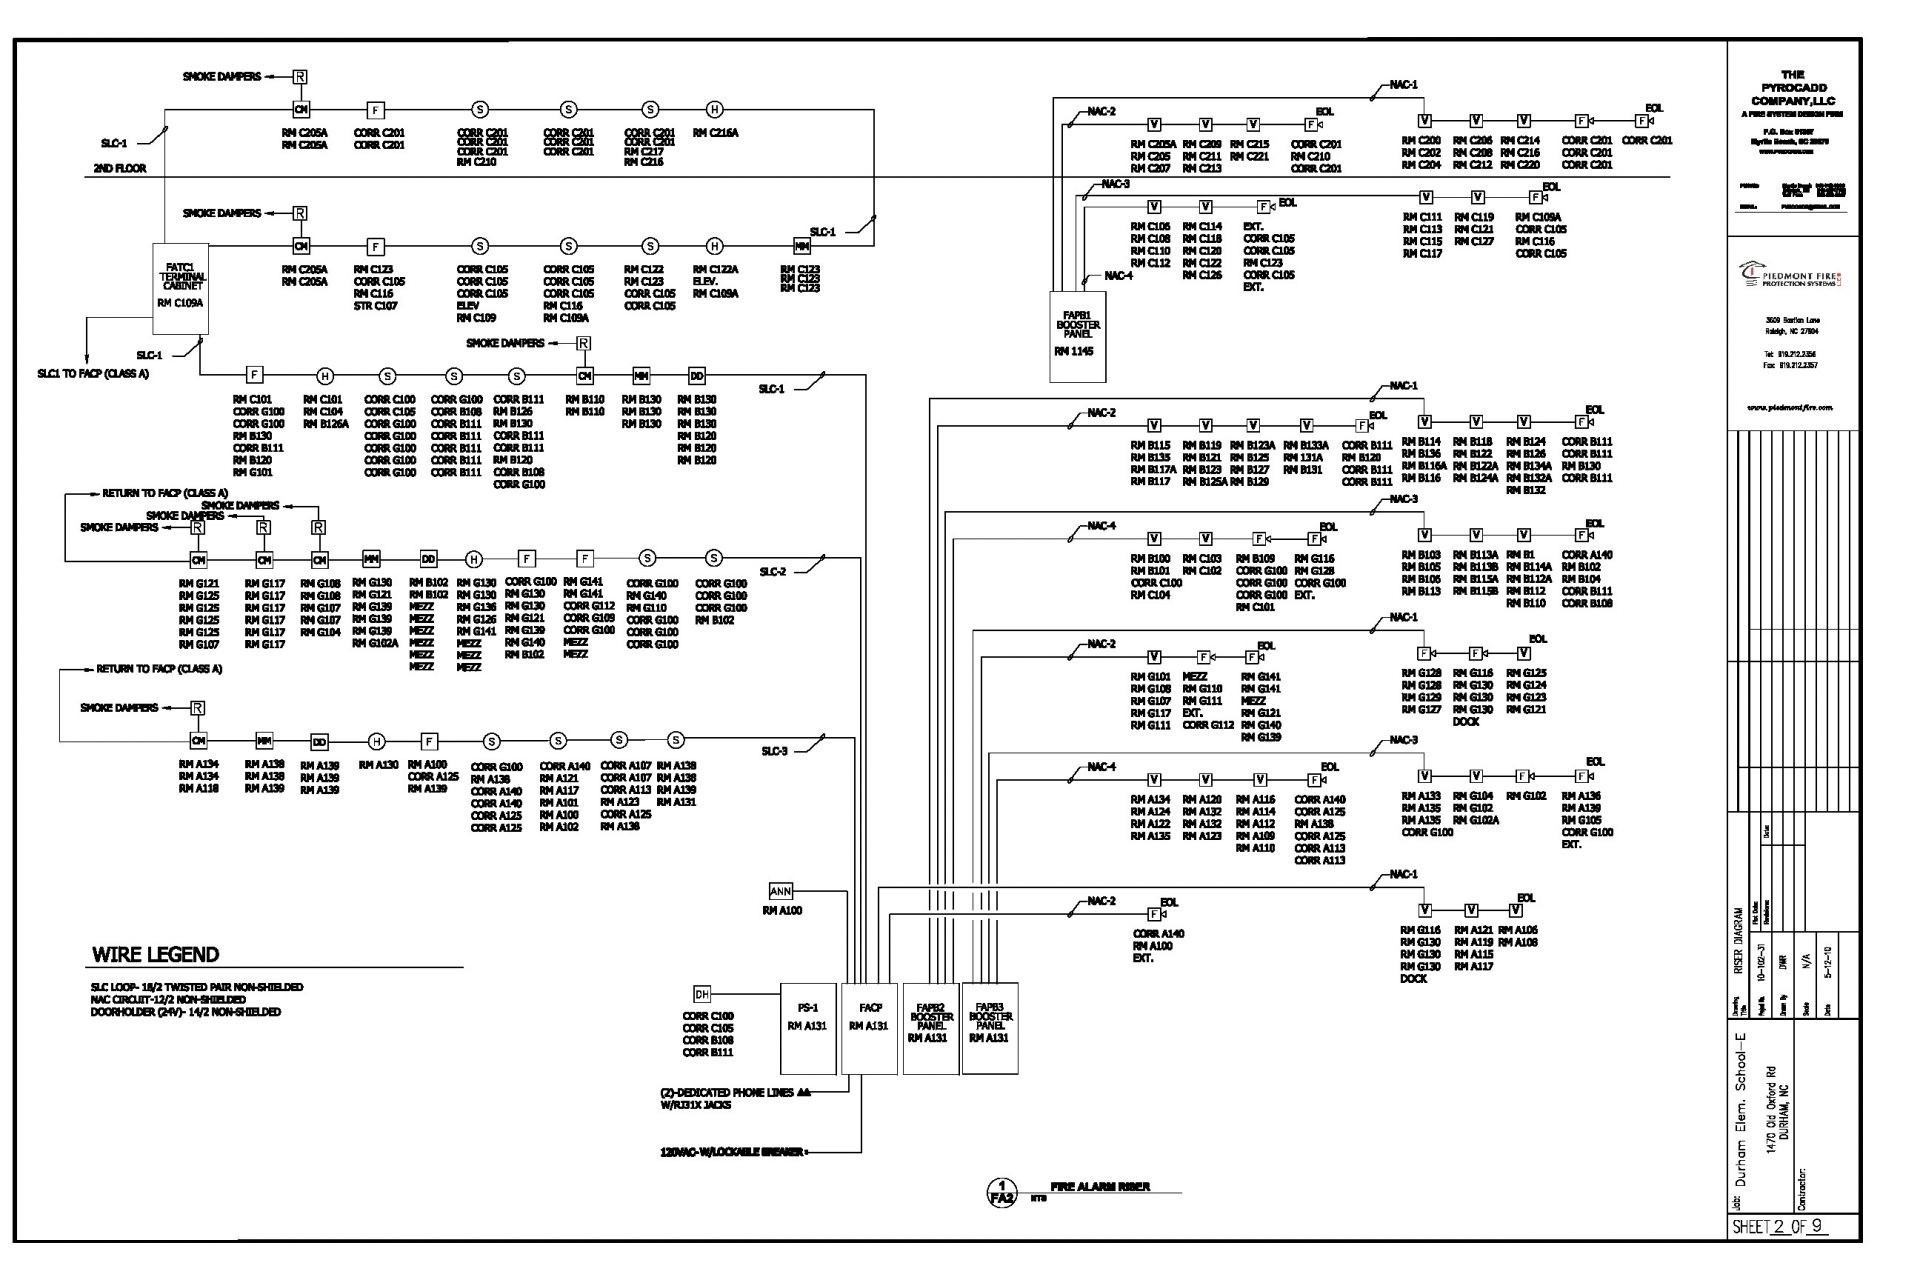 Interconnected Smoke Alarm Wiring Diagram Wiring Diagram 34 Smoke Detector Wiring Diagram Of Interconnected Smoke Alarm Wiring Diagram